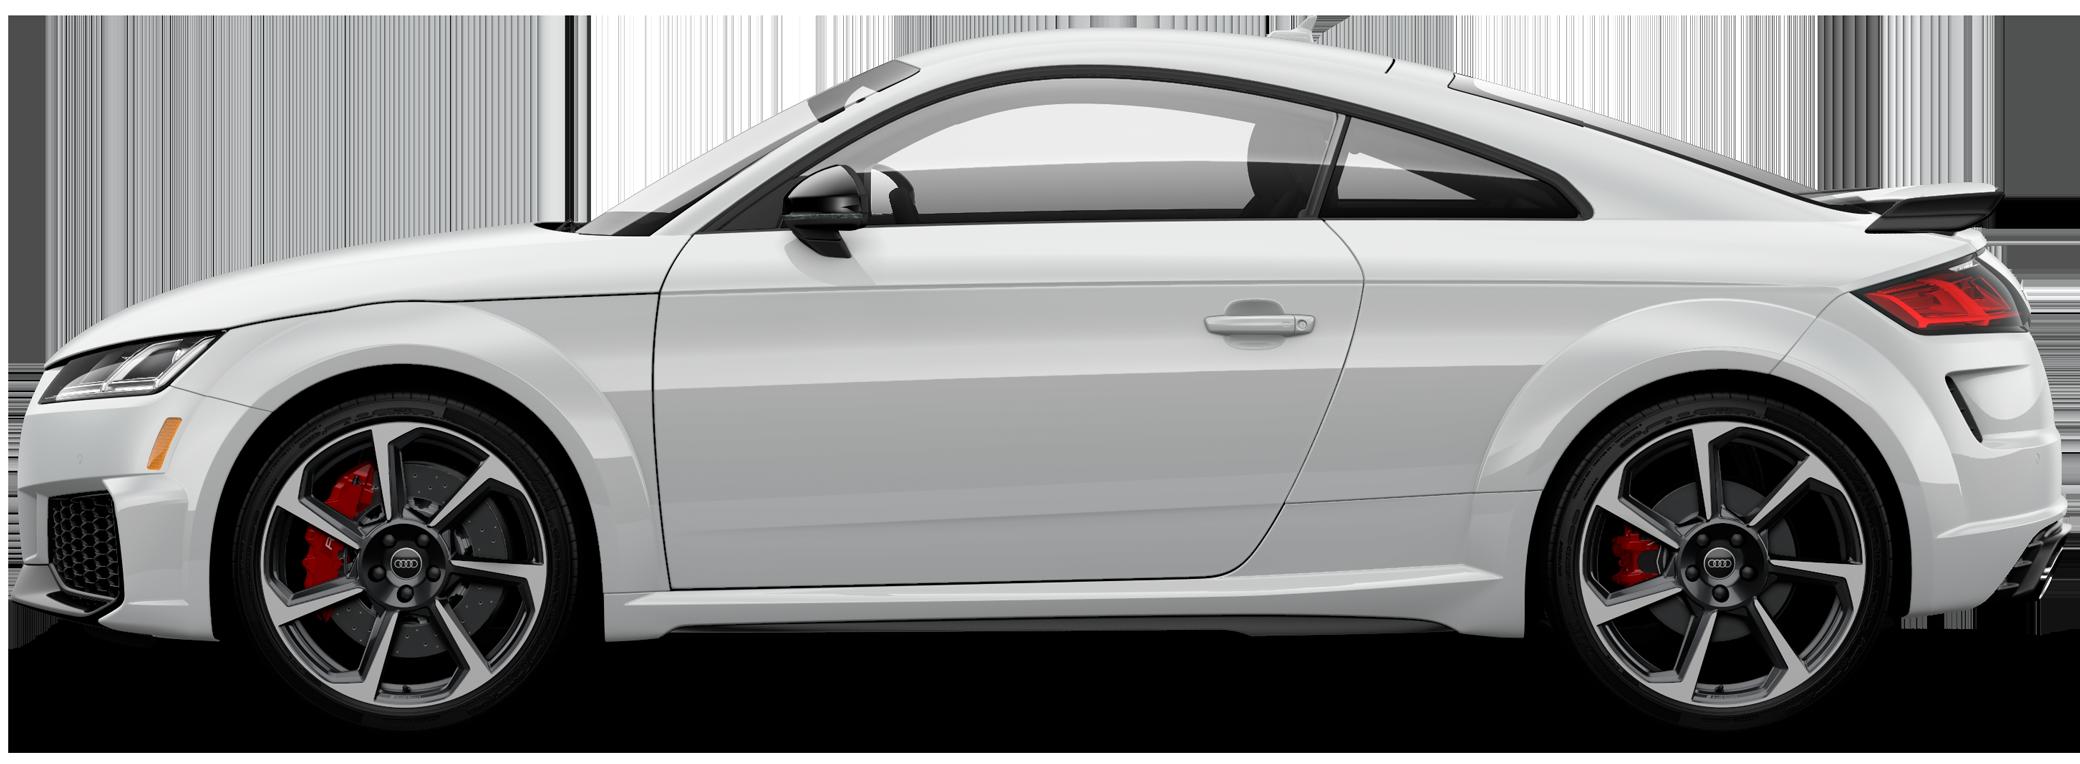 Audi Showroom | New Audi | Audi Dealer Near Me